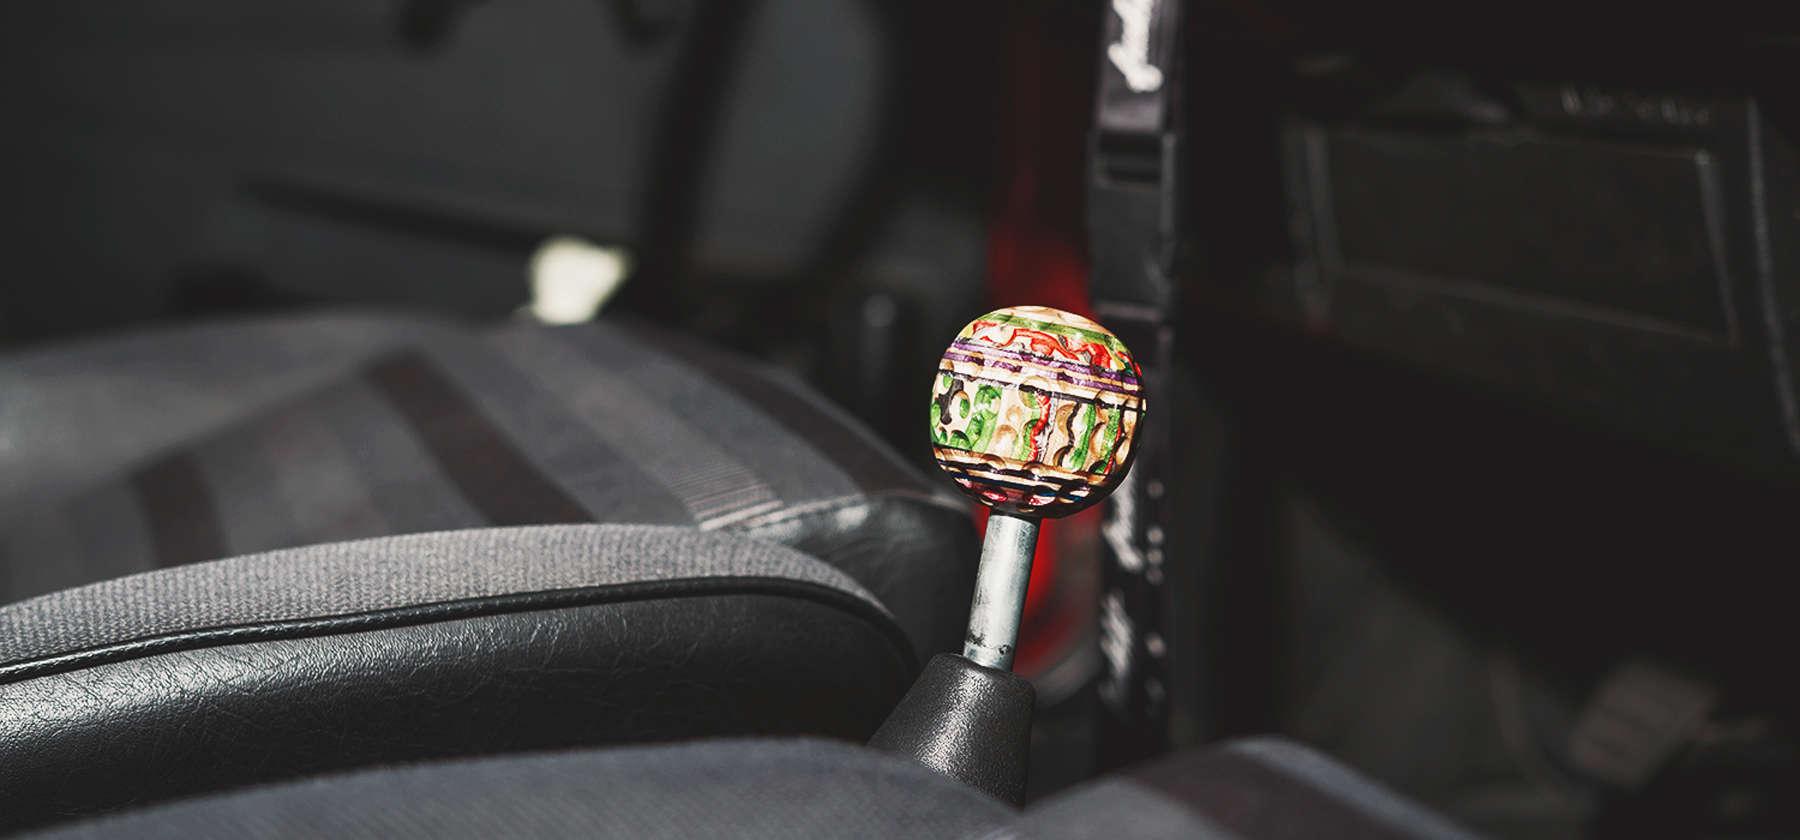 Golfball shift knob